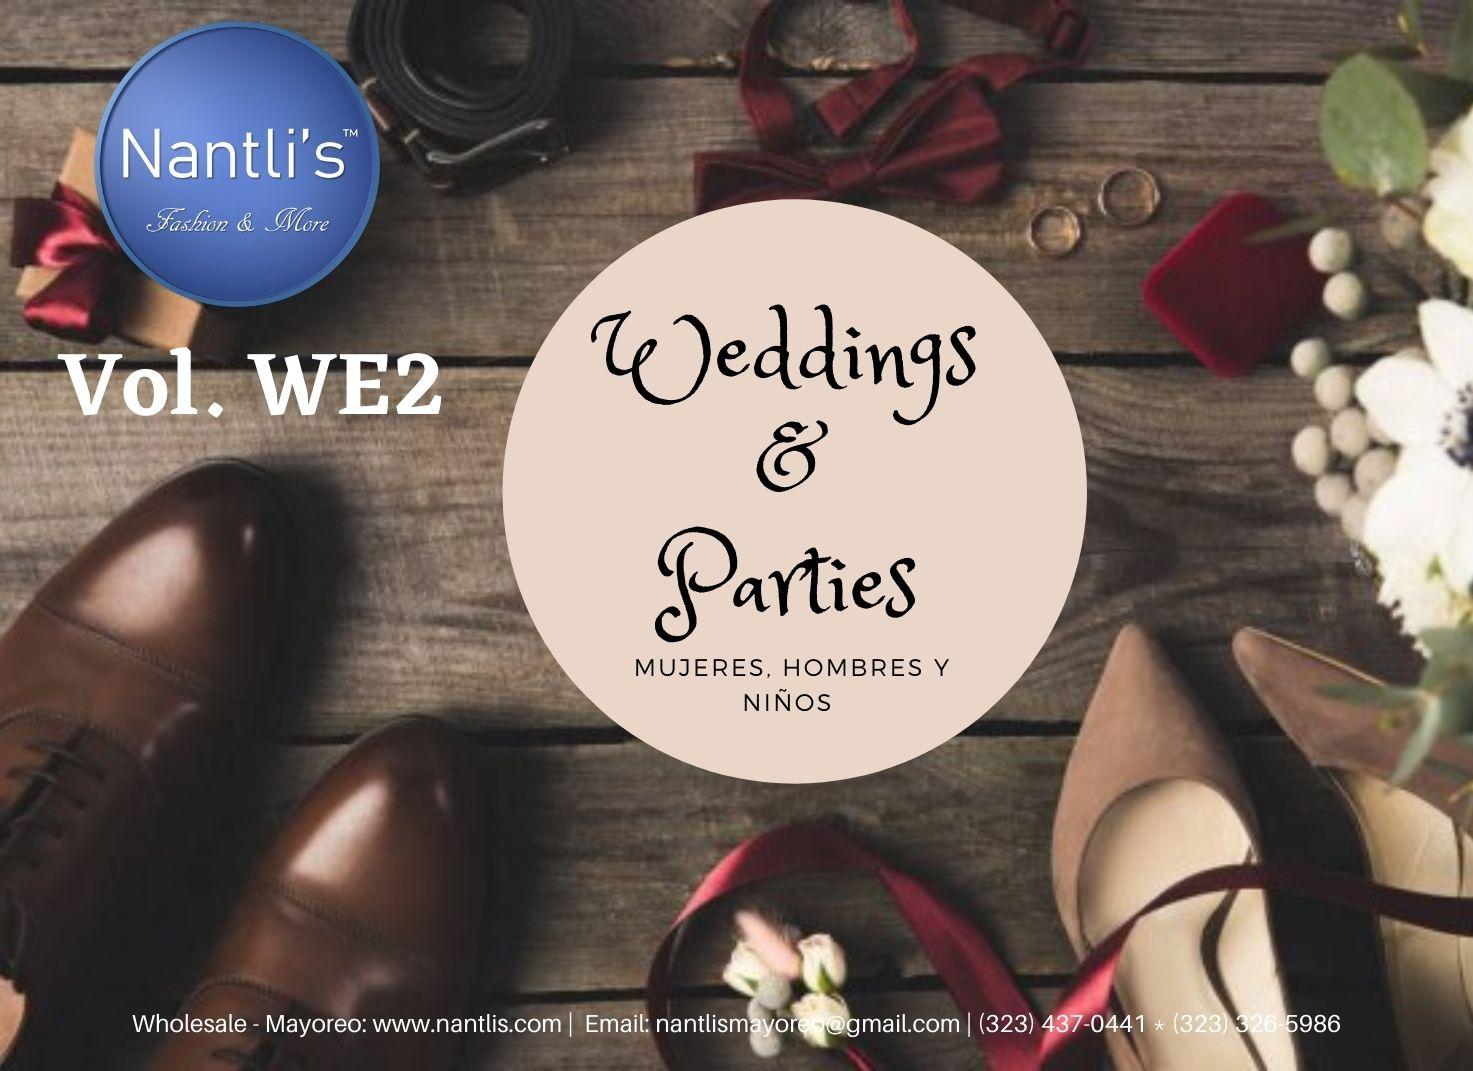 Nantlis Vol WE2 Bodas y Fiestas - Weddings and Parties Page-01